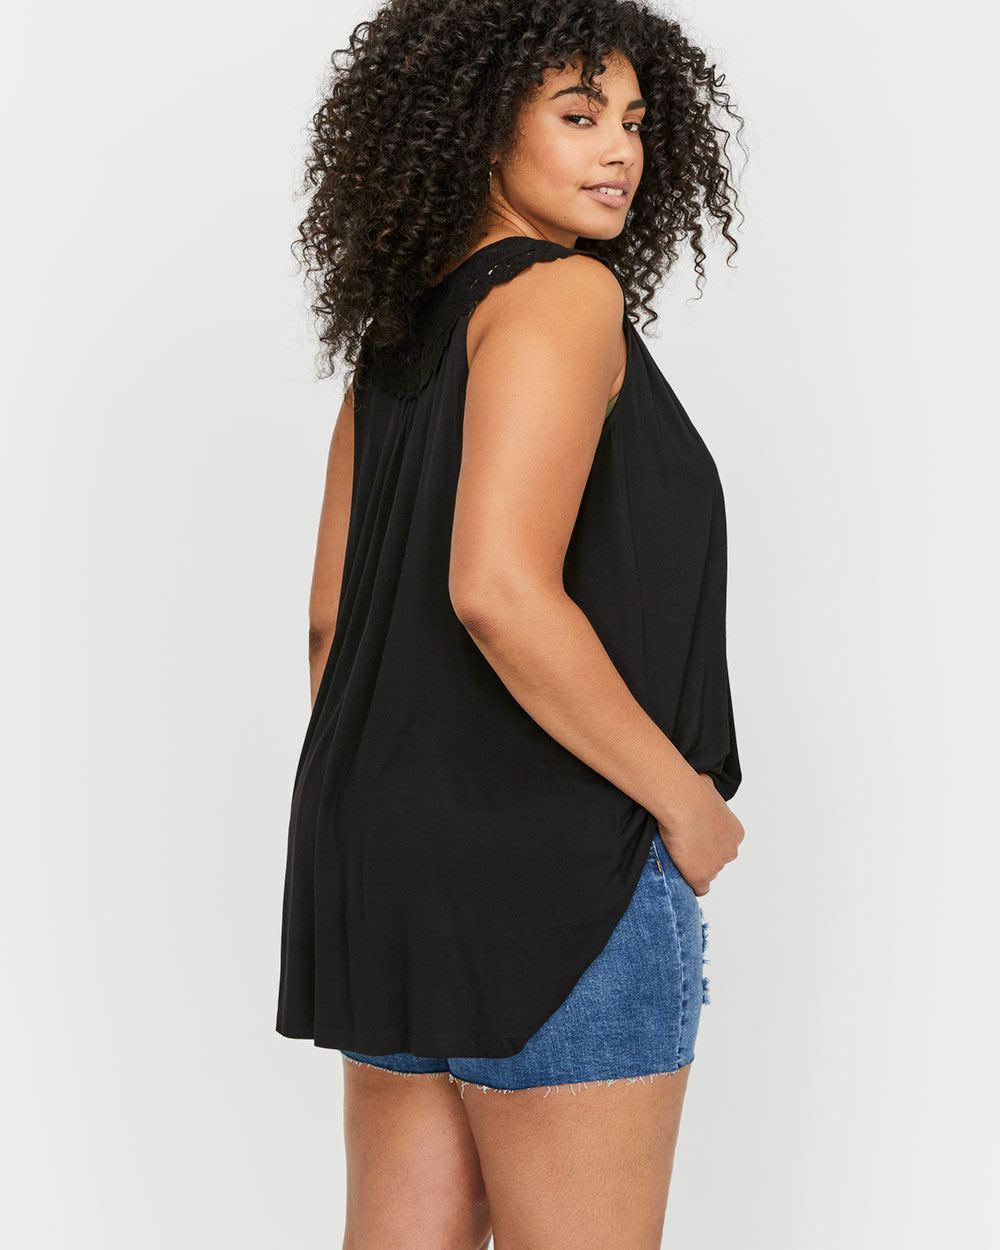 197c3920c41 Addition Elle Michel Studio Sleeveless Lace Trim Cardigan in Black ...